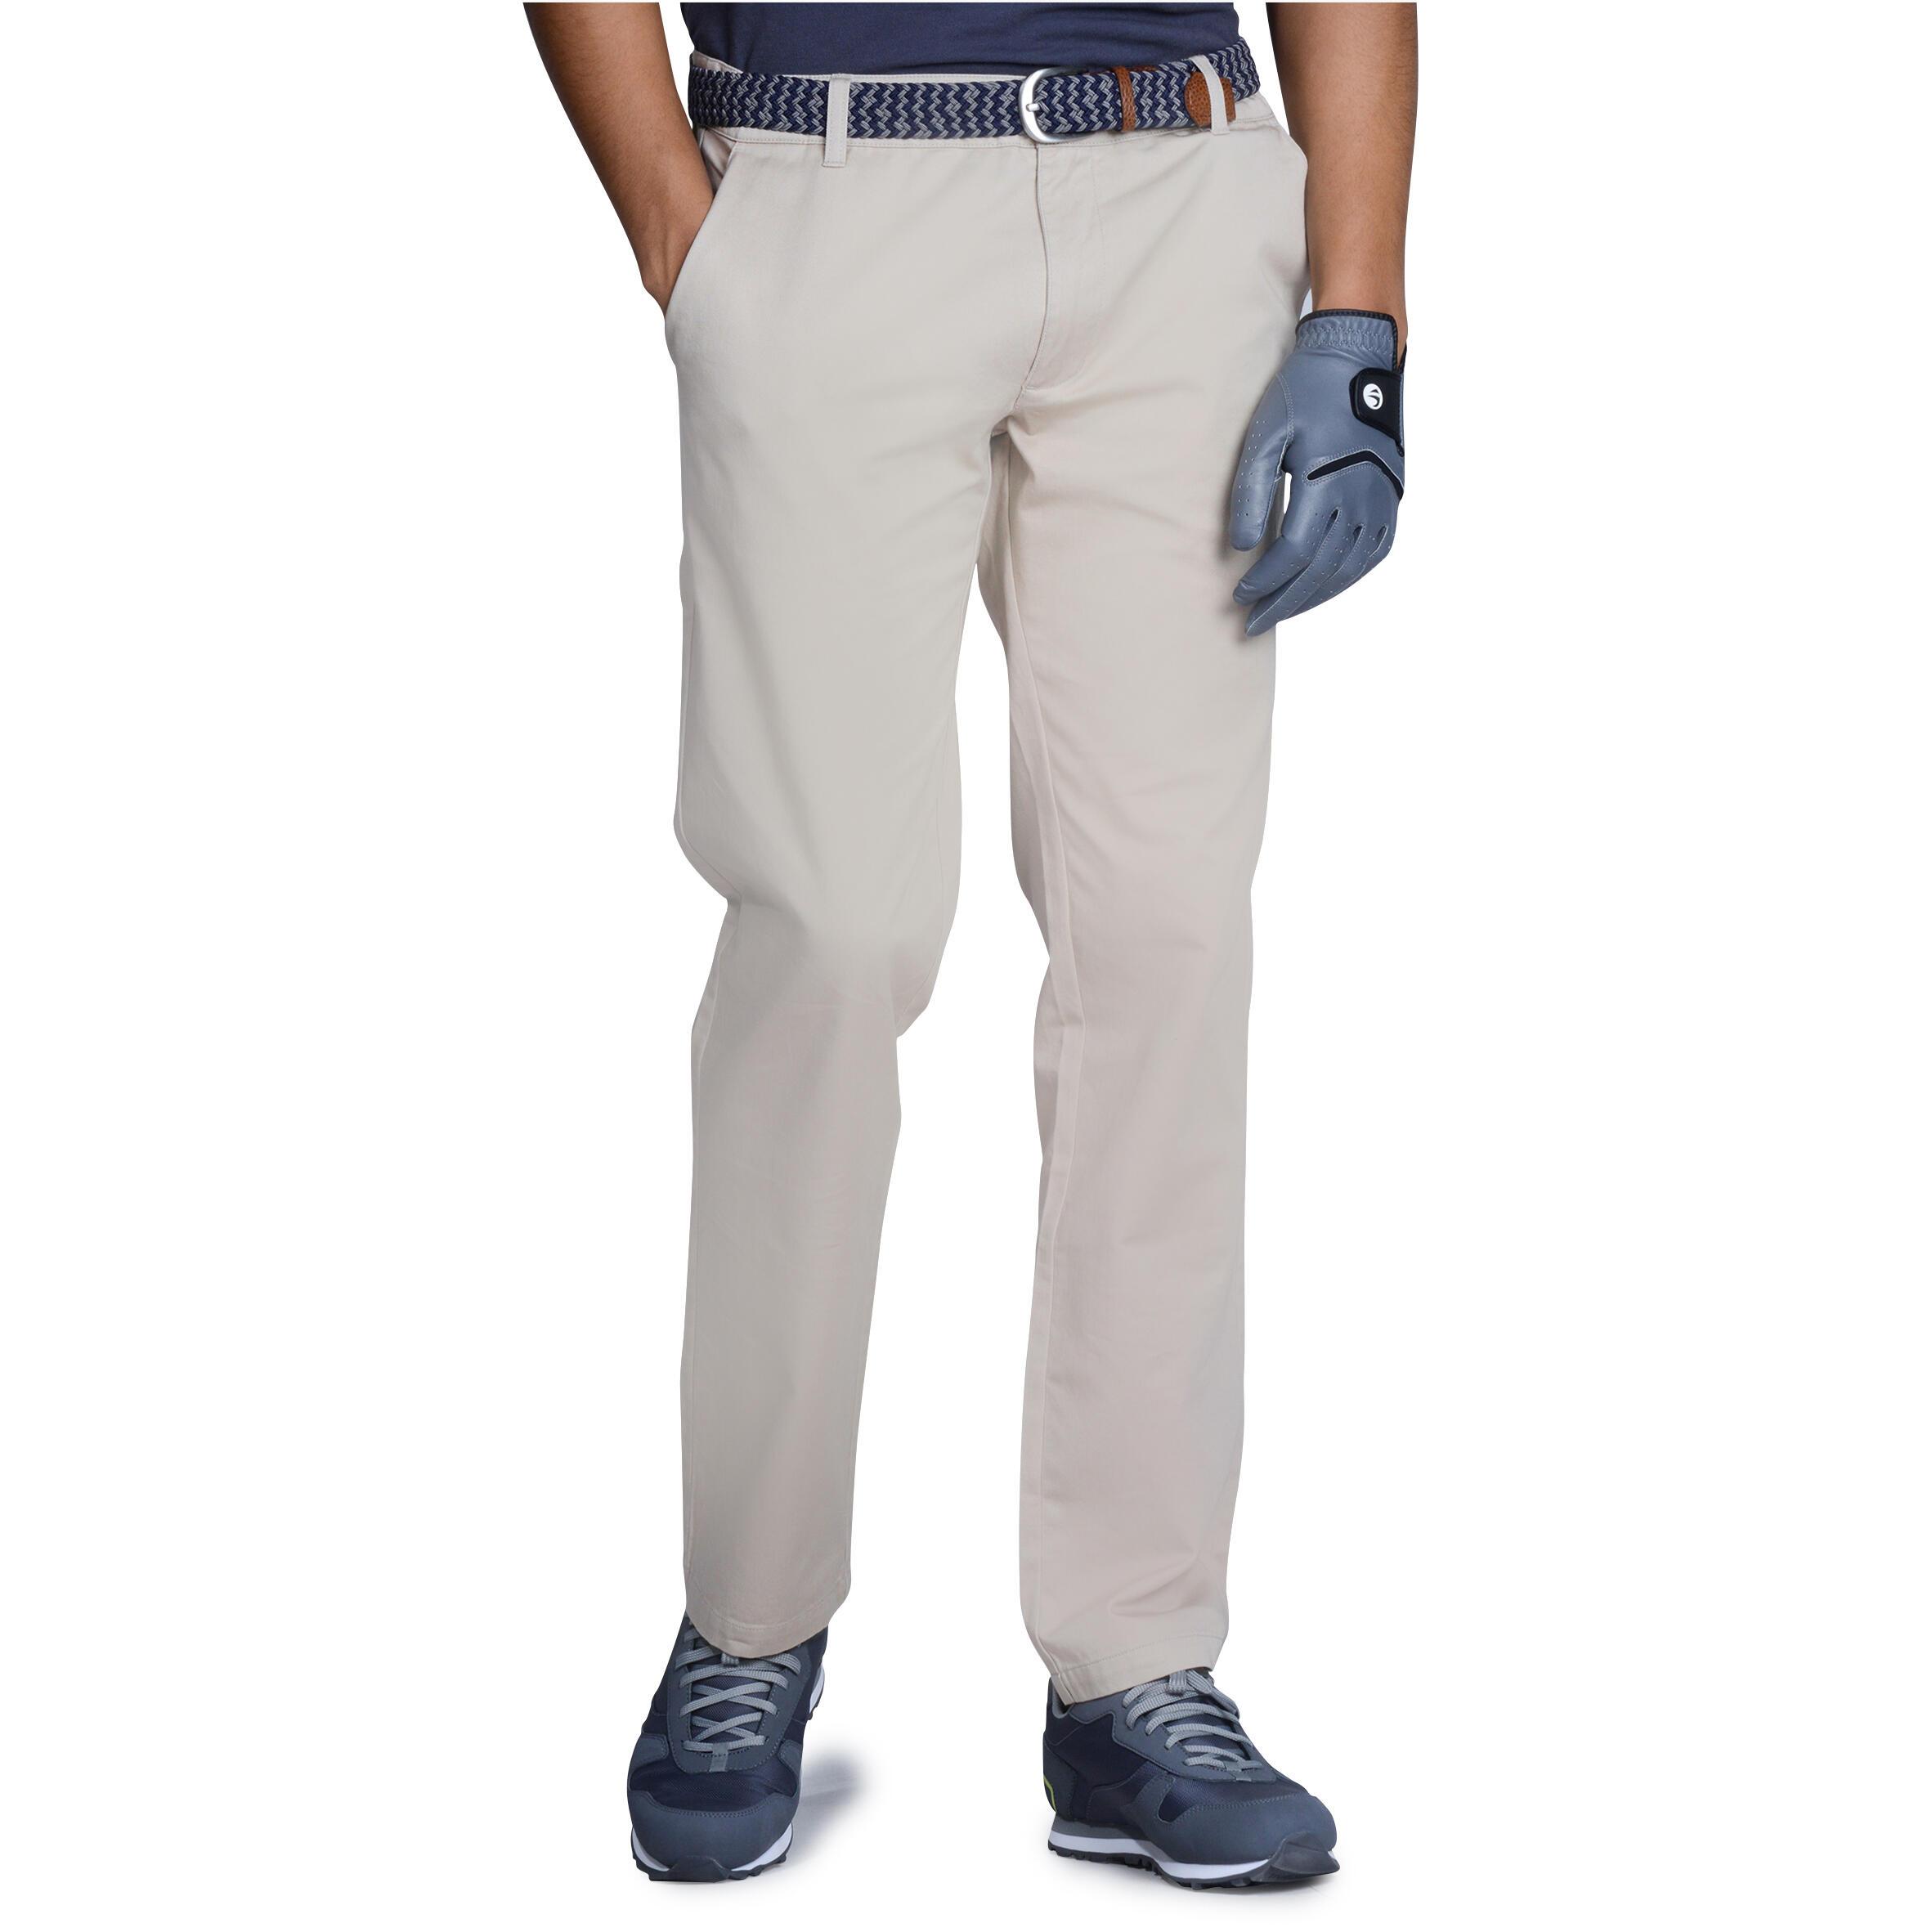 Men's Golf Trousers...